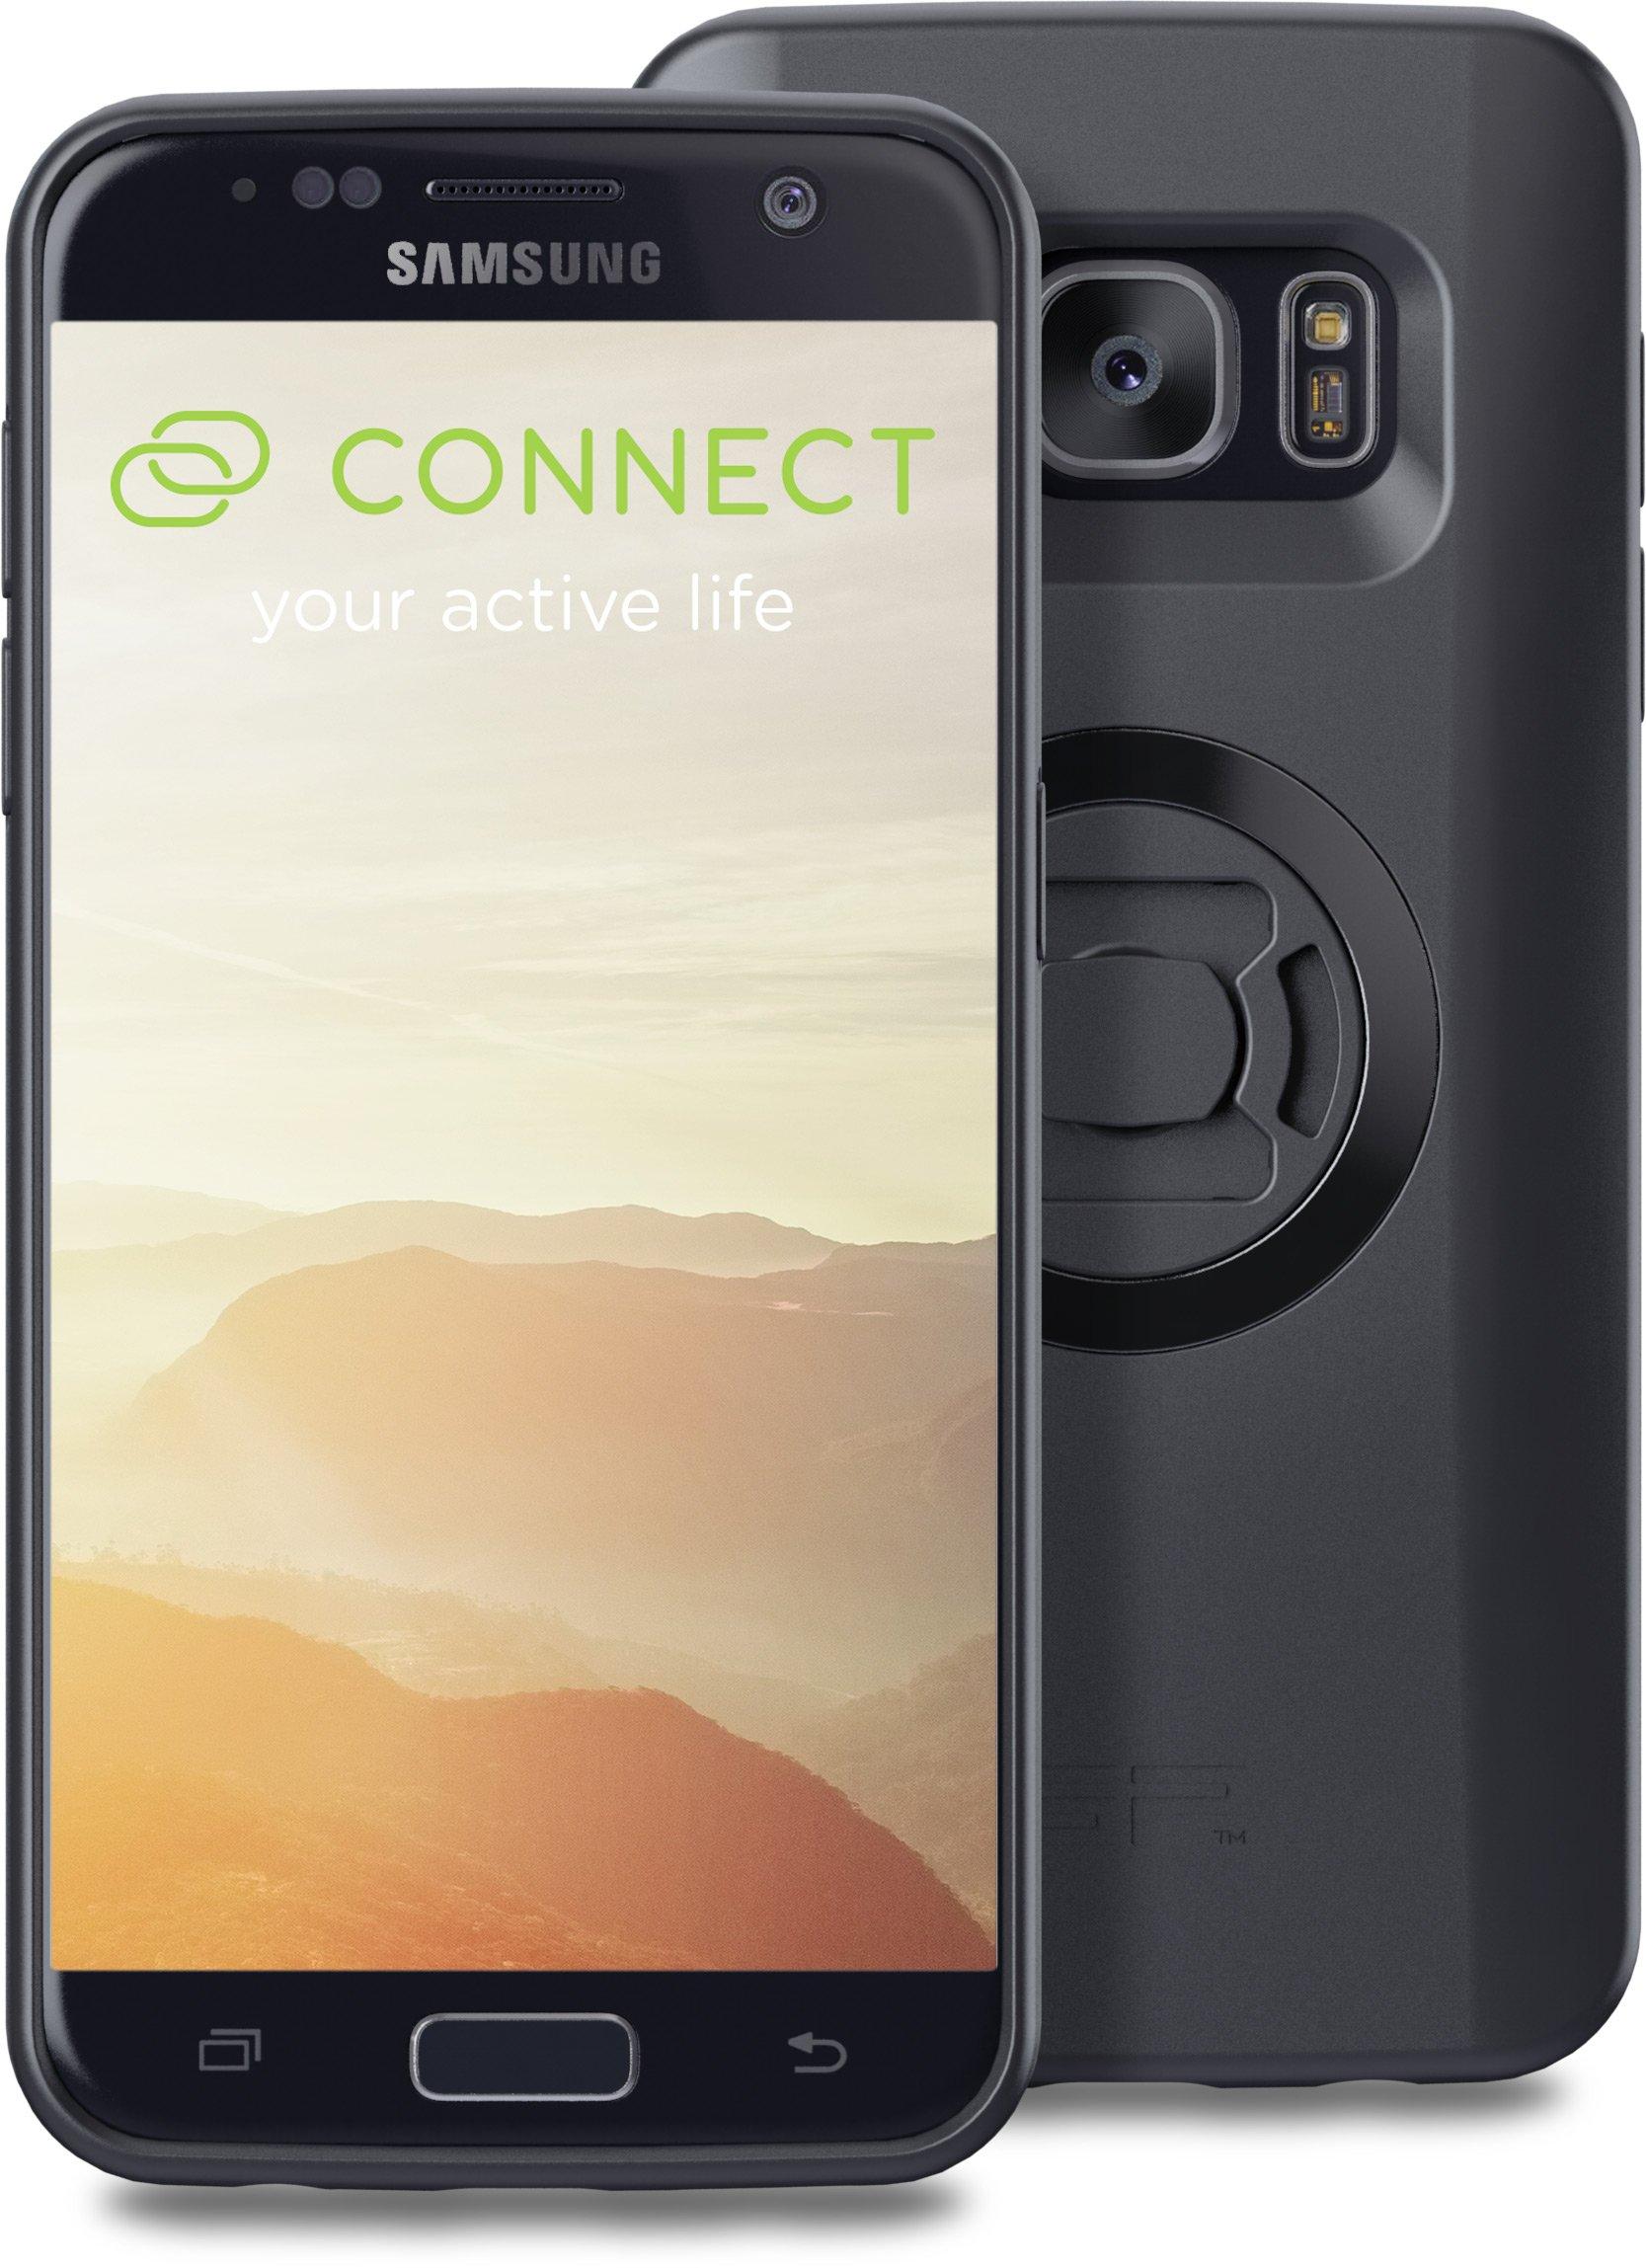 SP Connect Phone Case Set (Smasung Galaxy S7)